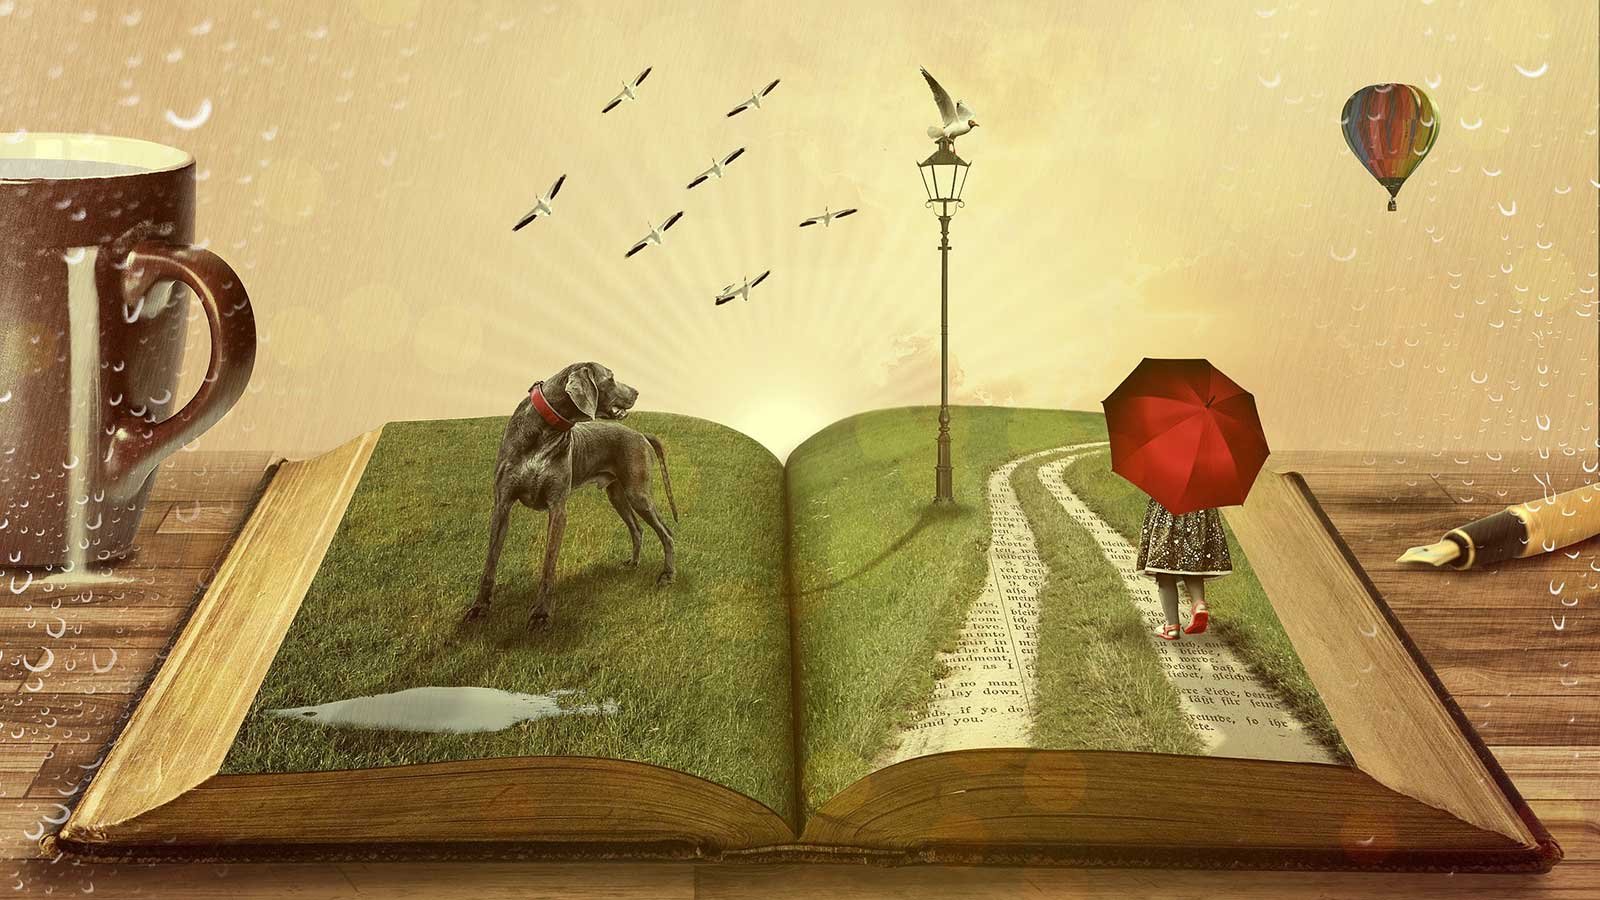 Übung macht den Storyteller